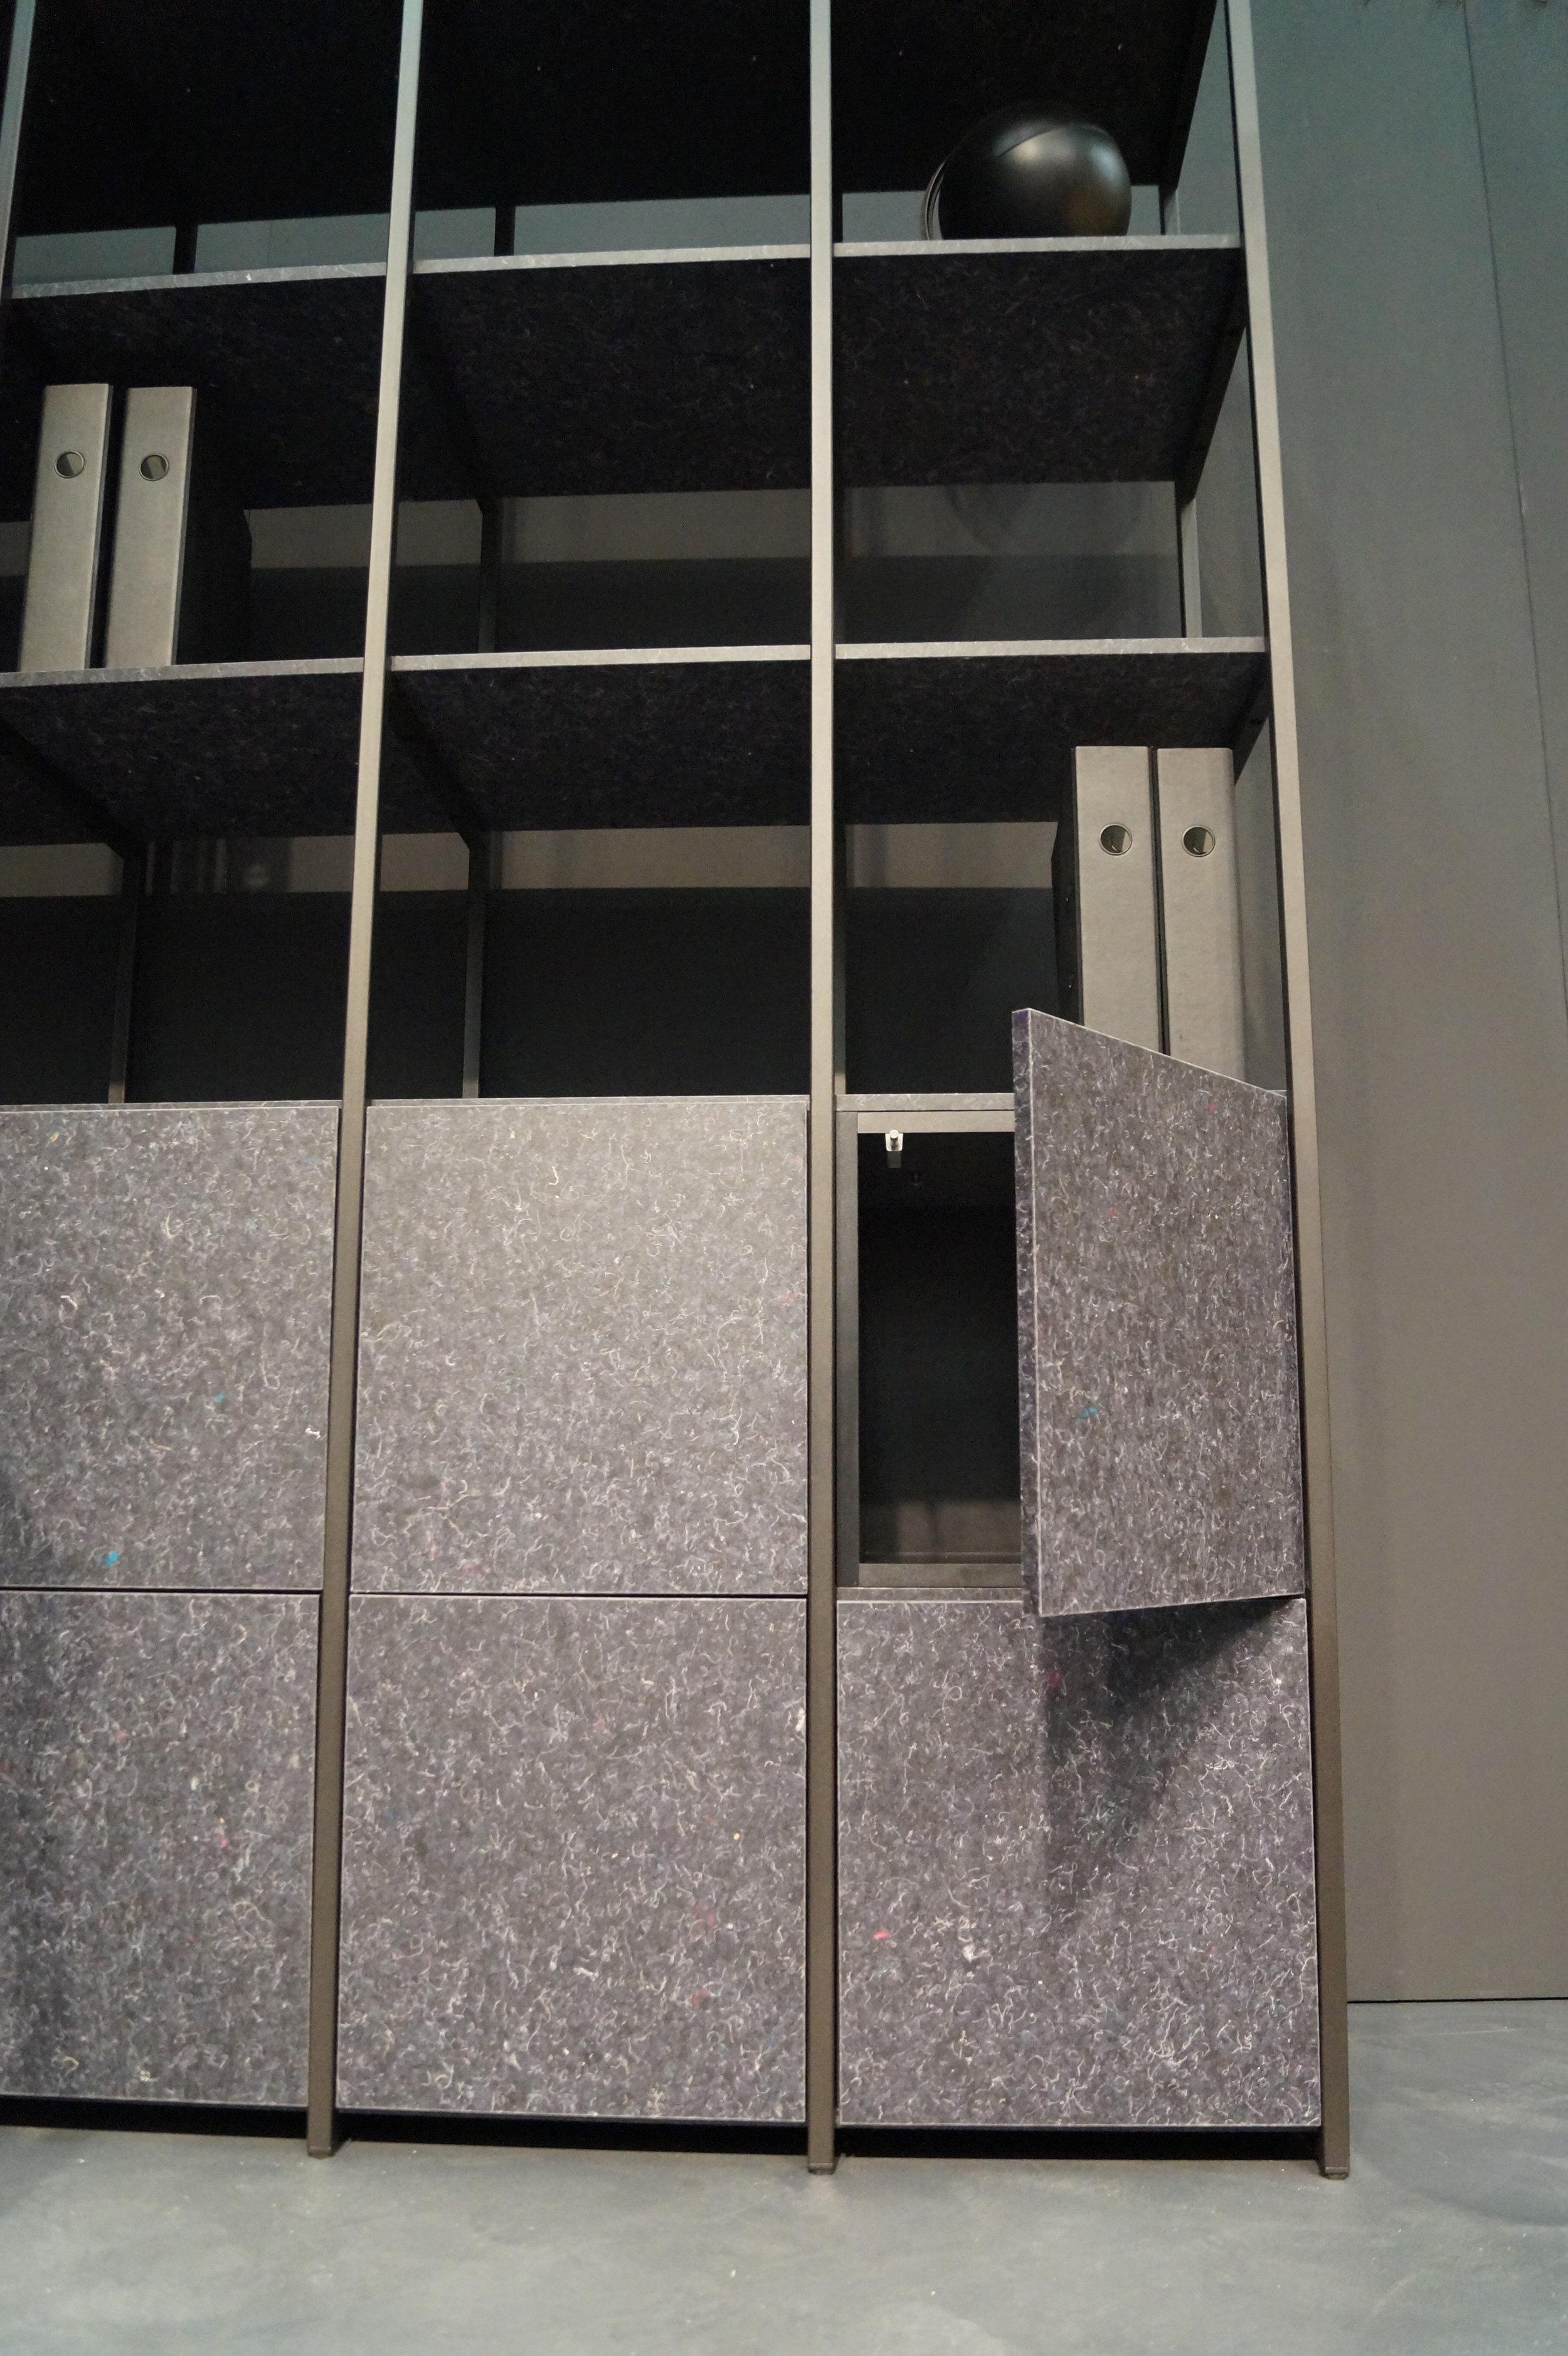 Cubics_XL_01.JPG